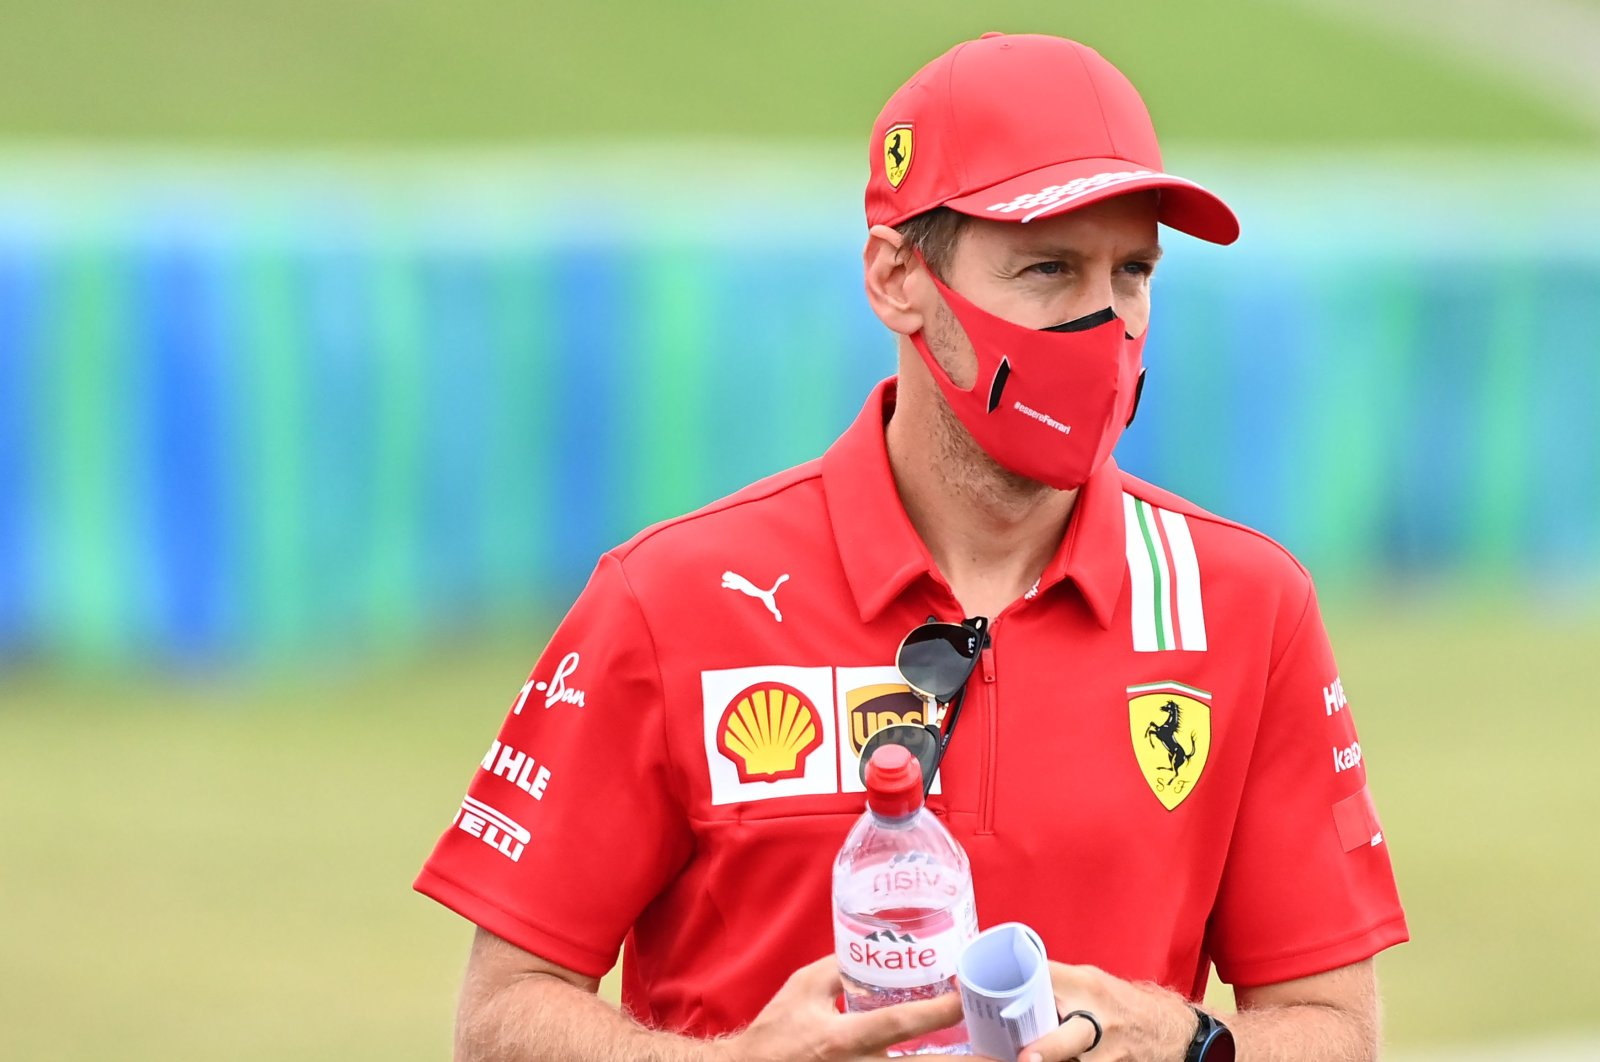 Ferrari's Sebastian Vettel walks along the race track ahead of the F1 Hungarian GP, Budapest, Hungary, July 16, 2020. (AFP Photo)